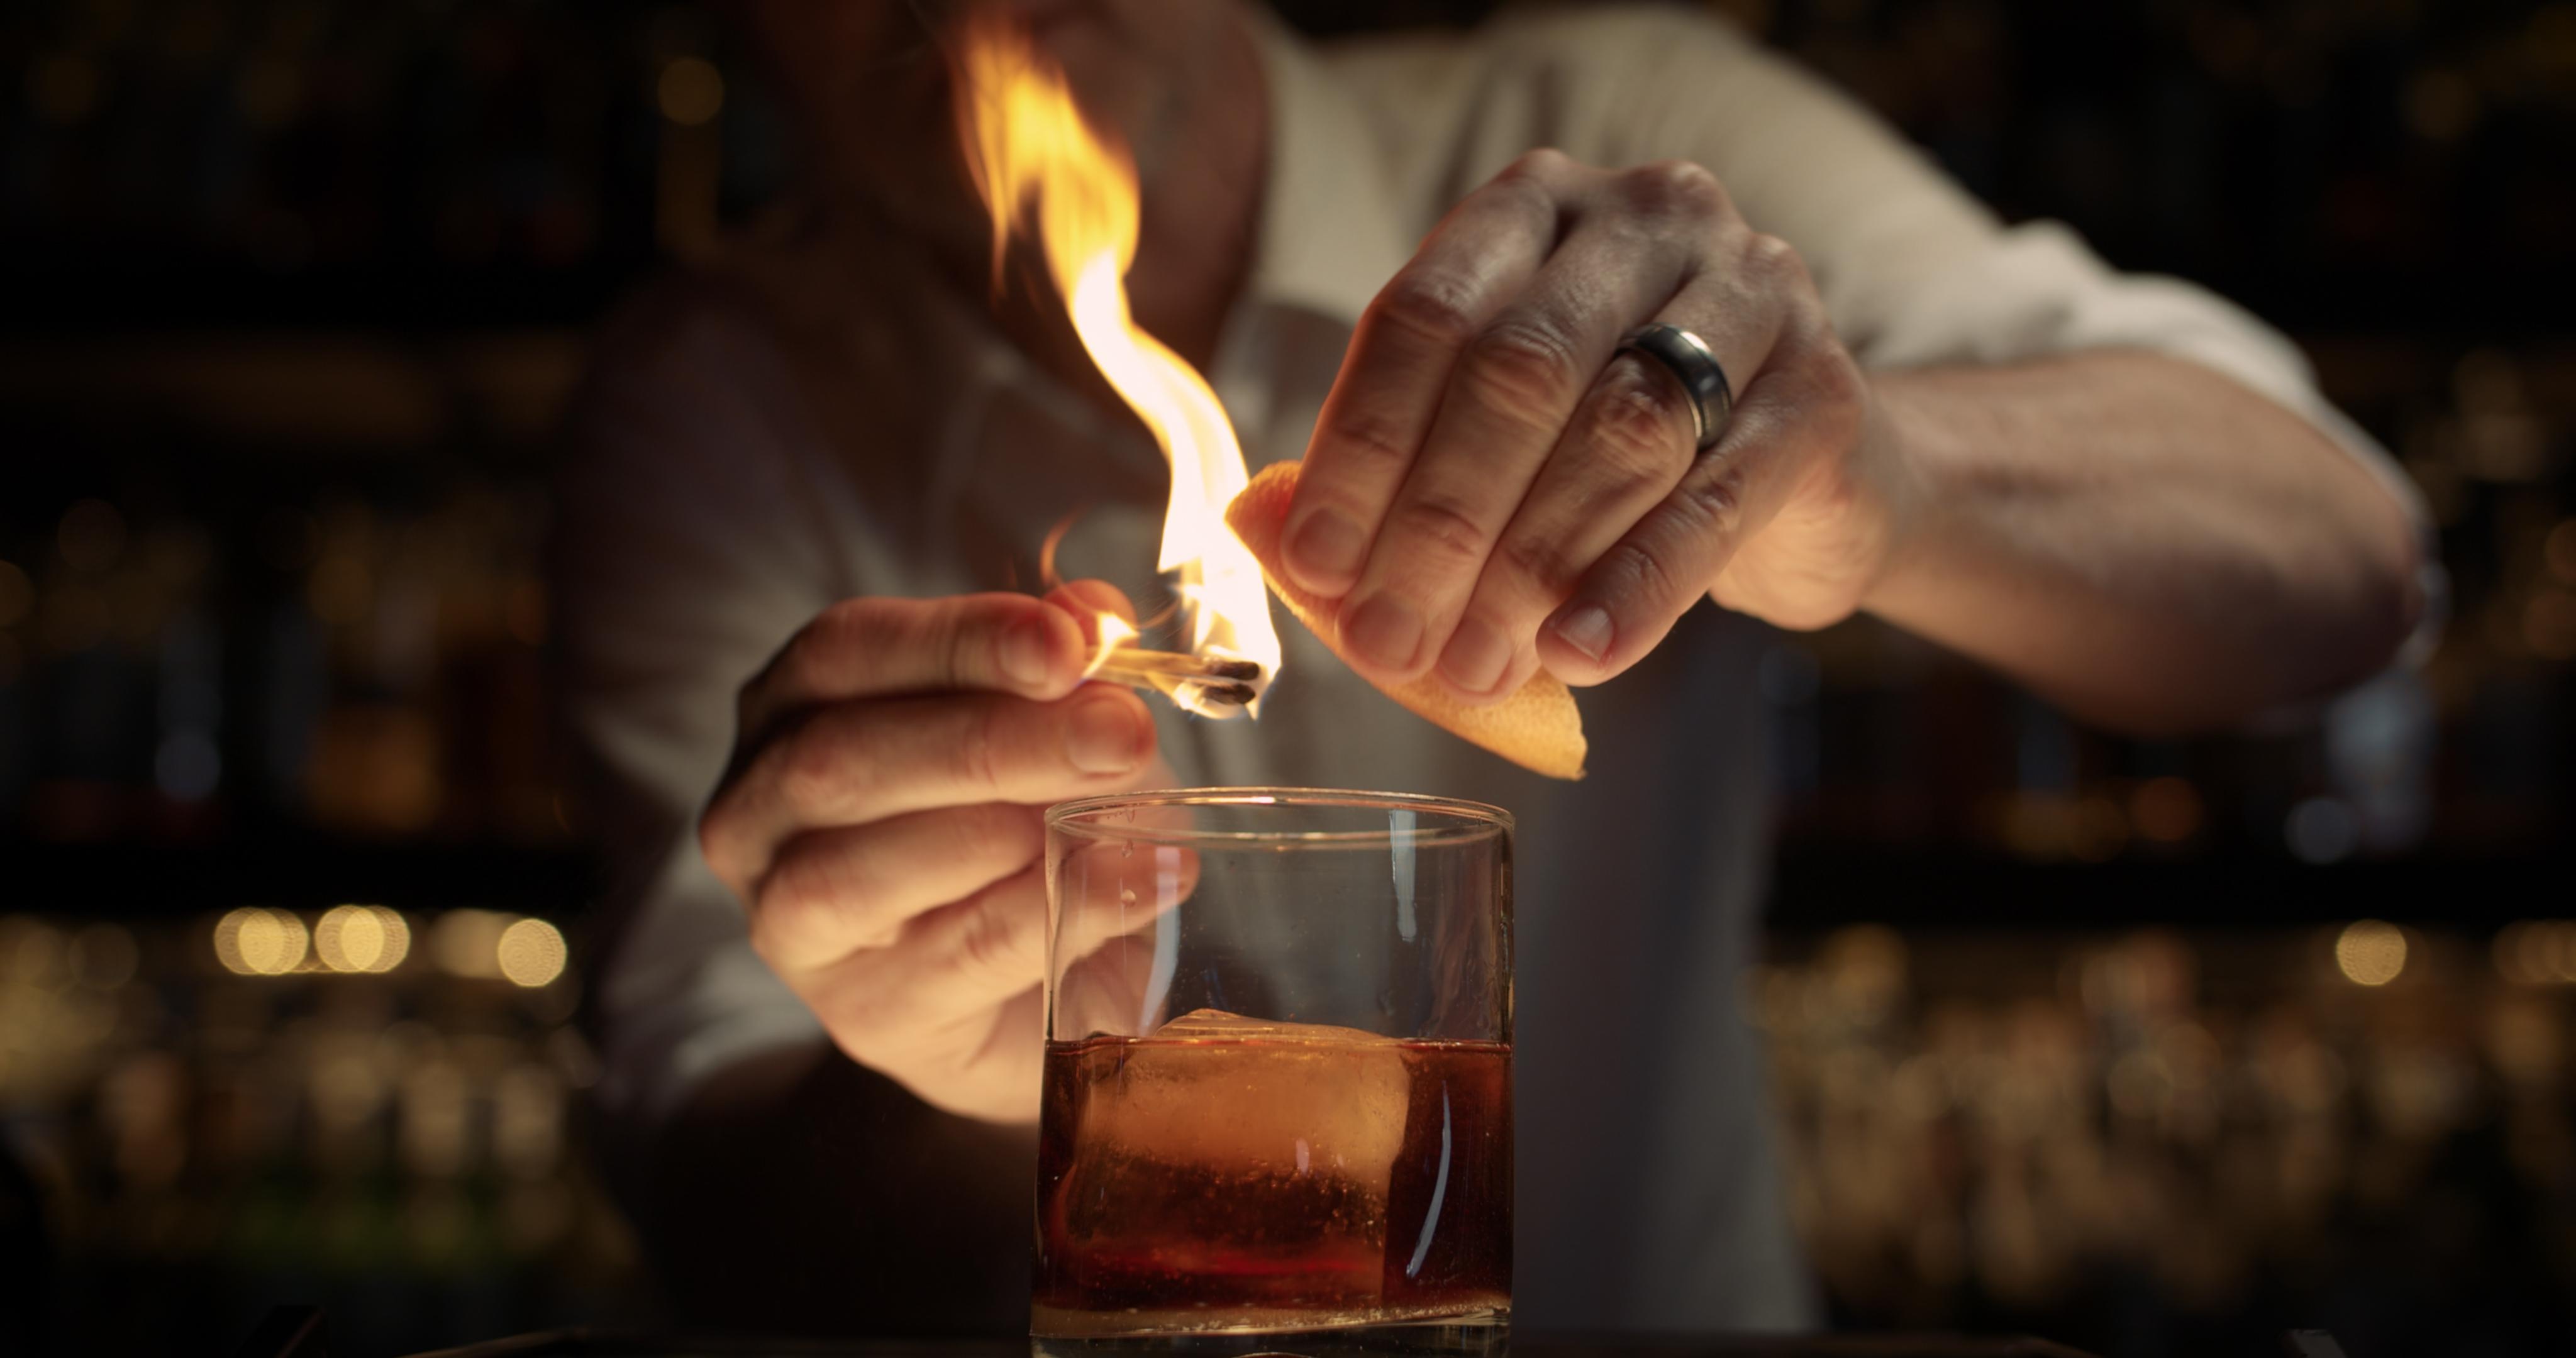 Cocktail Being garnished